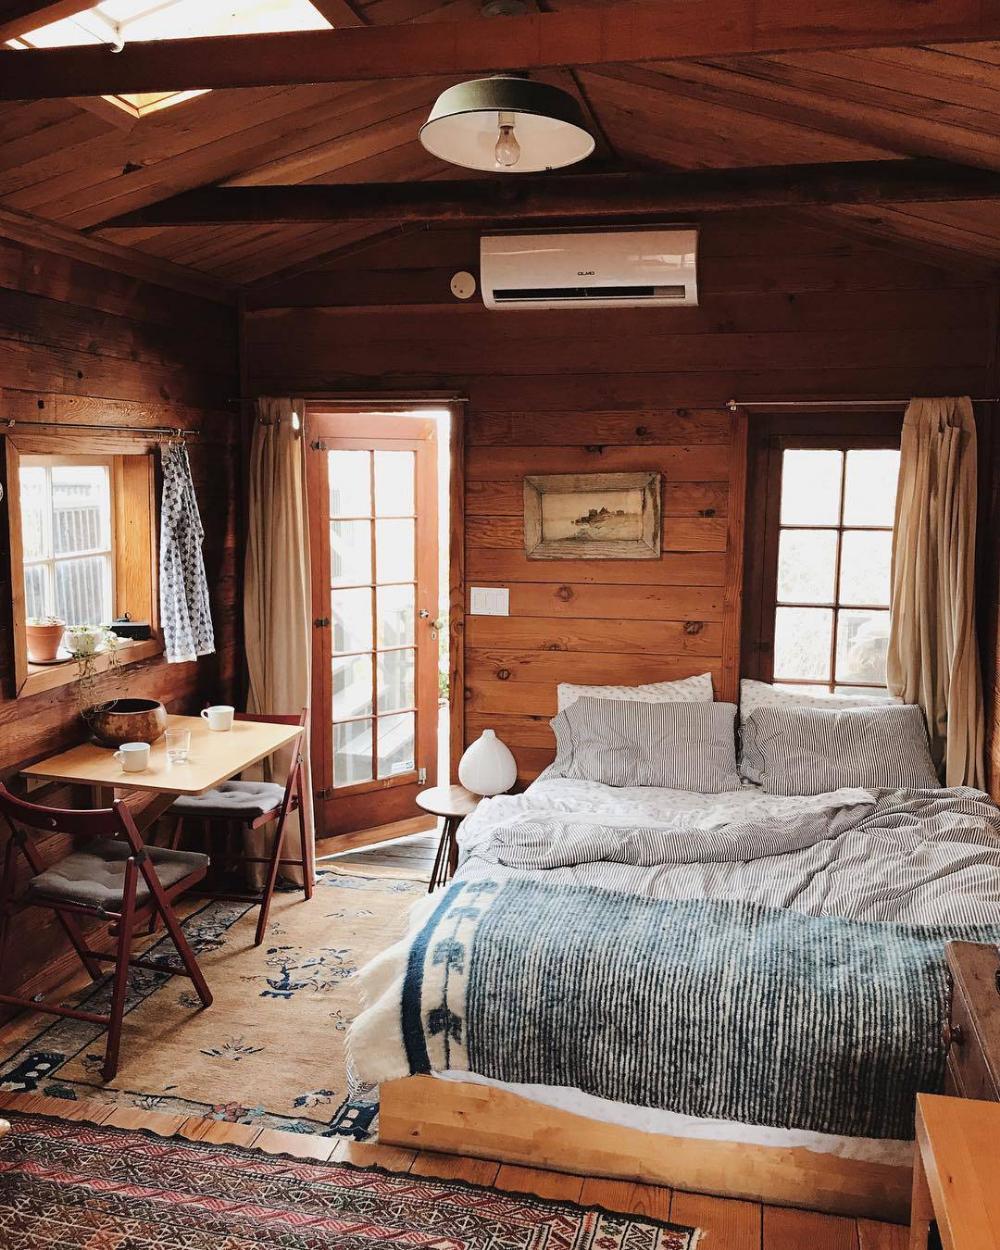 Pin By Jenn Fabian On Country Bedroom In 2020 Cozy Cabin Bedrooms Cabin Interior Design Cabin Room Design